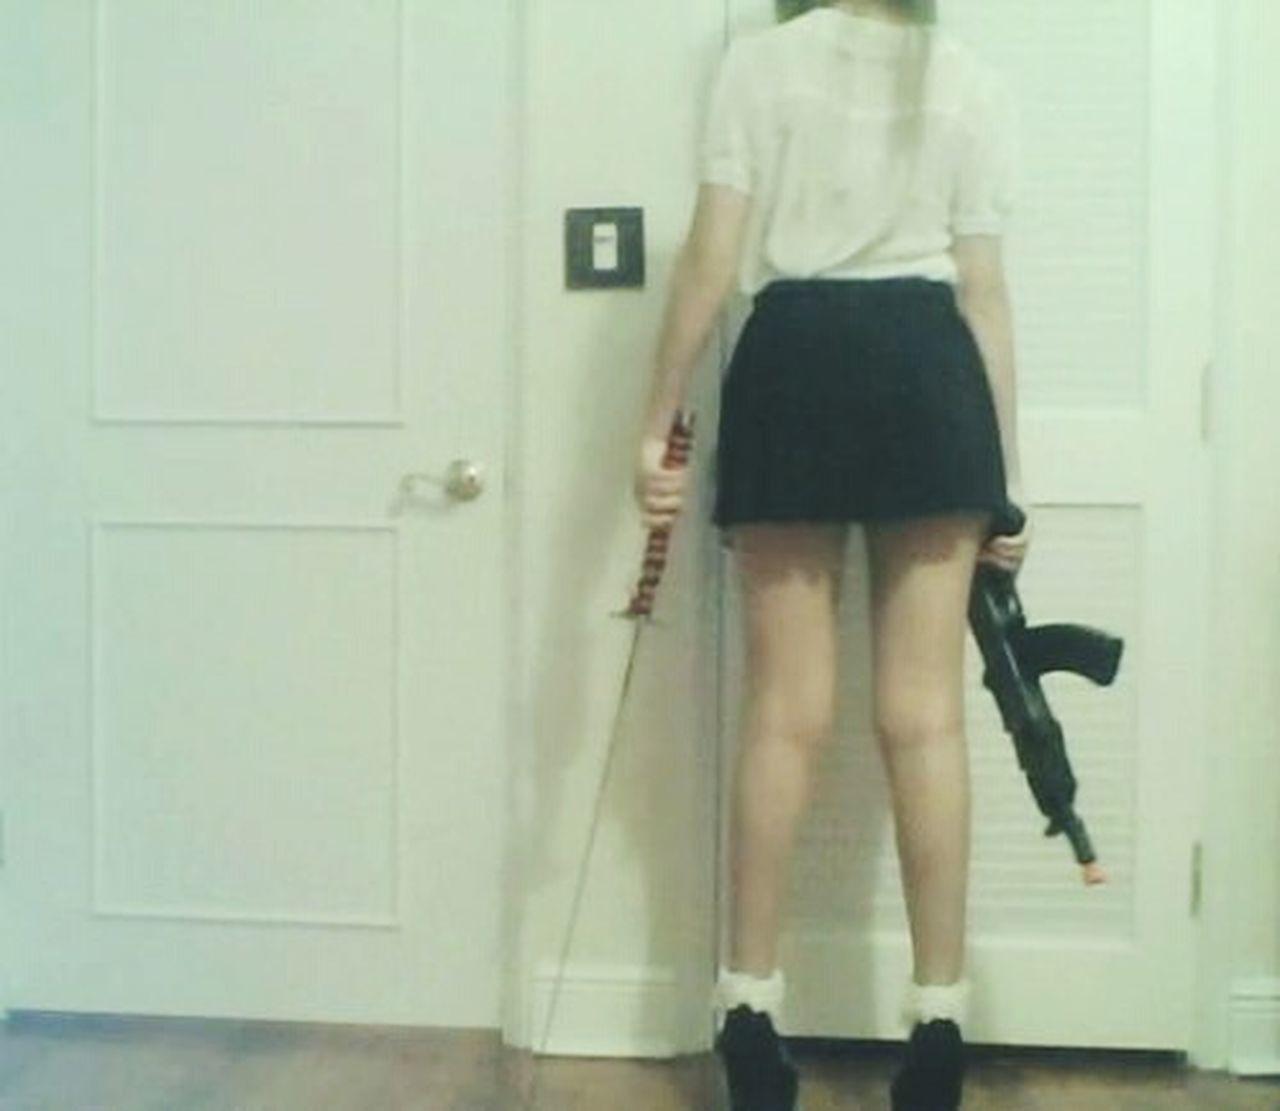 Russian Girl Bad Girl Bad Girl  Russia Student Russian Student Fantasy Reality Hard Girl